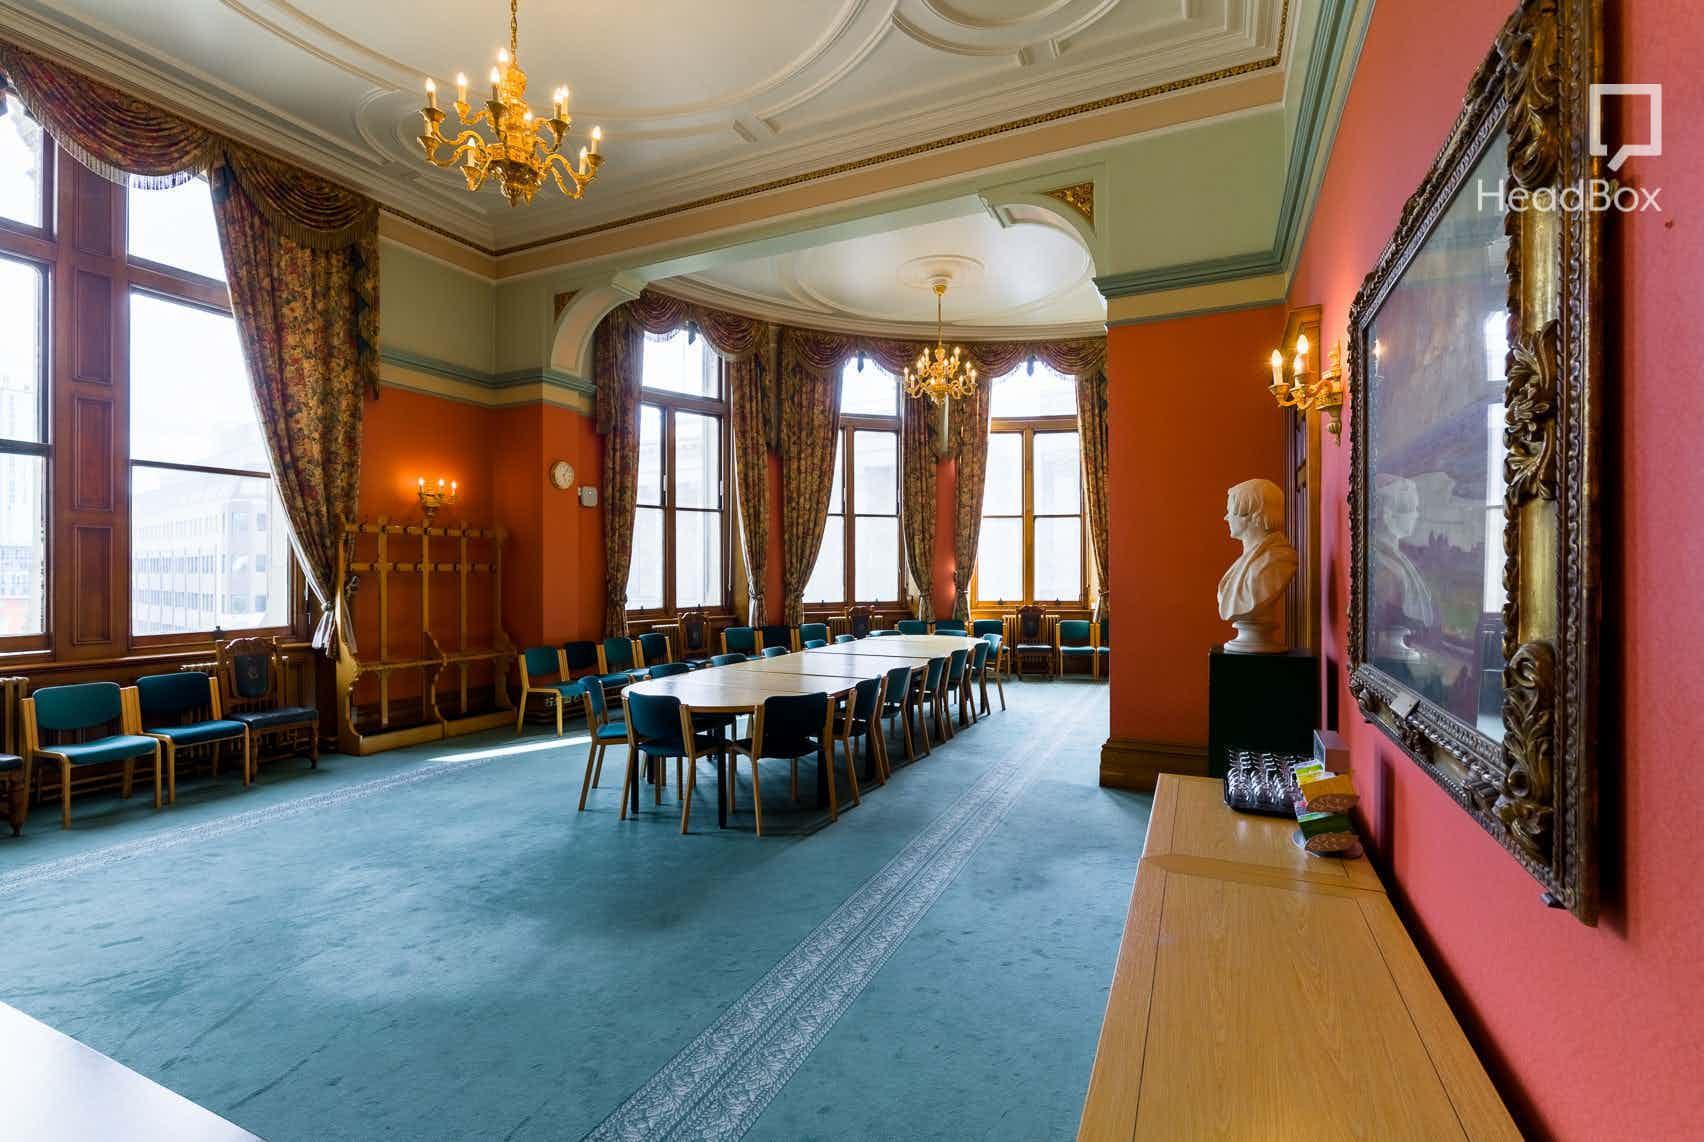 Chamberlain Room, Council House Birmingham